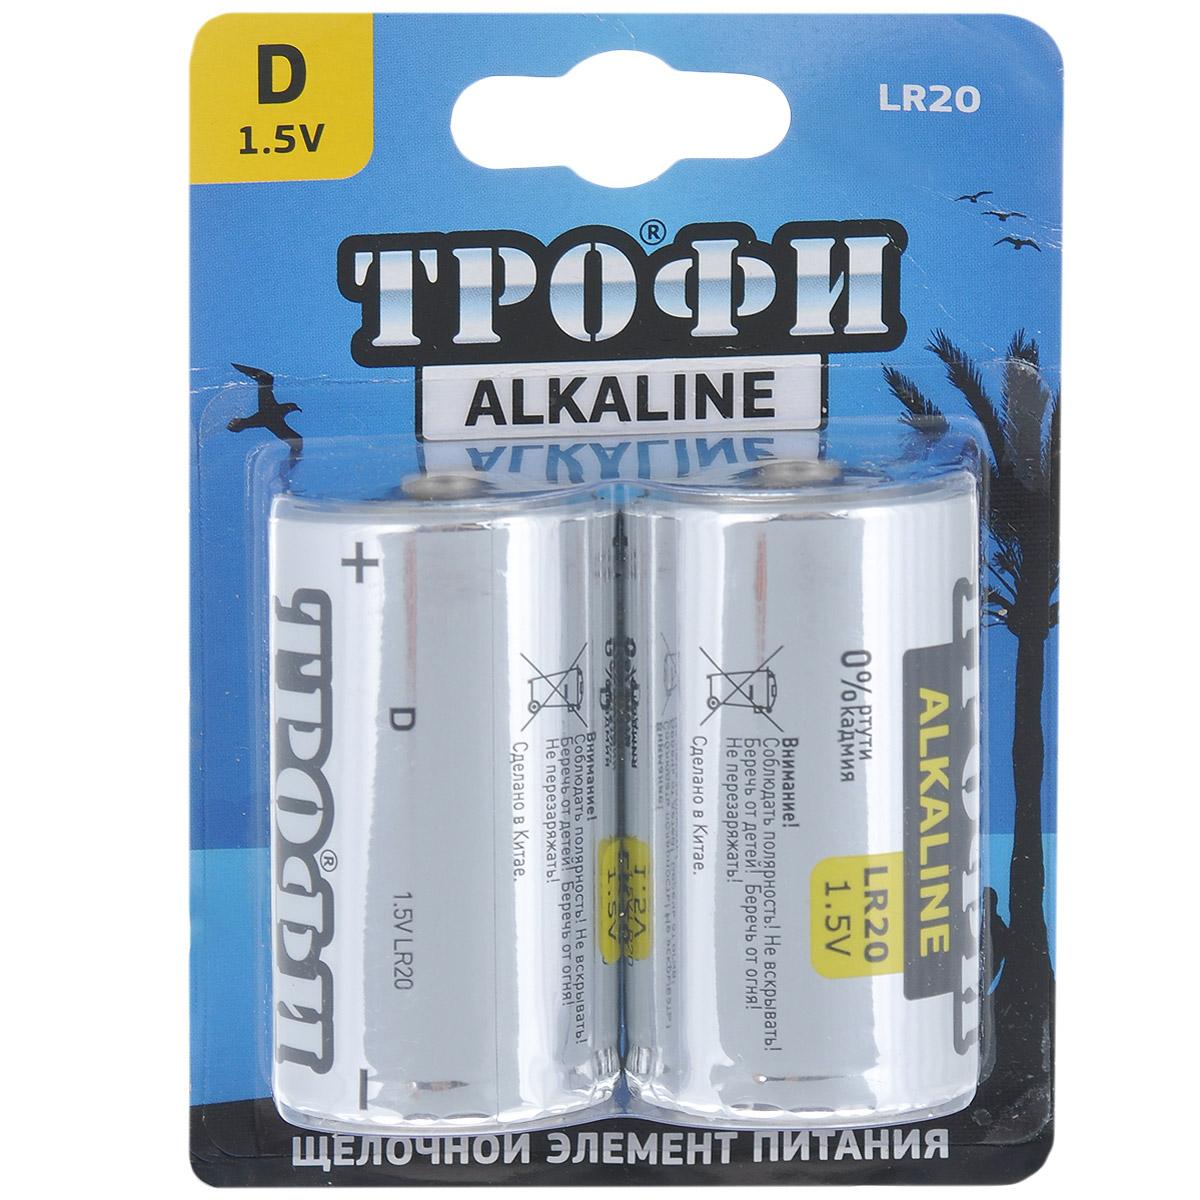 Батарейка алкалиновая Трофи, тип D (LR20), 1,5В, 2 шт